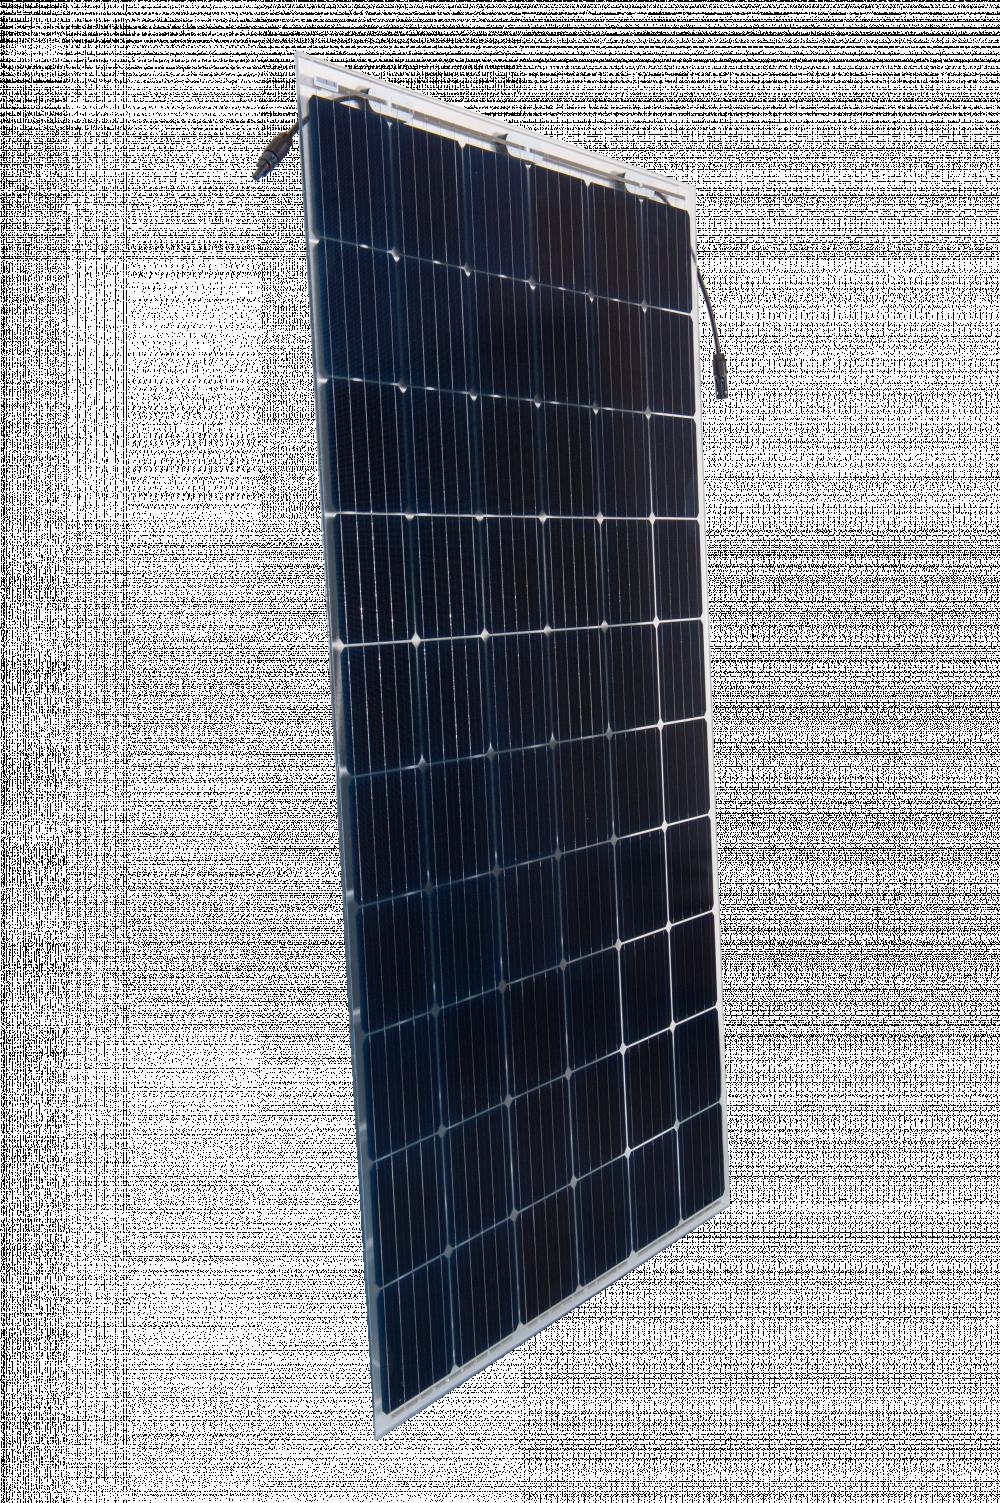 Описание солнечных батарей SUNTECH,Монокристаллические солнечные батареи SUNTECH,HyPro,STP300S — 20Wfk,STP295S — 20Wfk,STP290S — 20Wfk